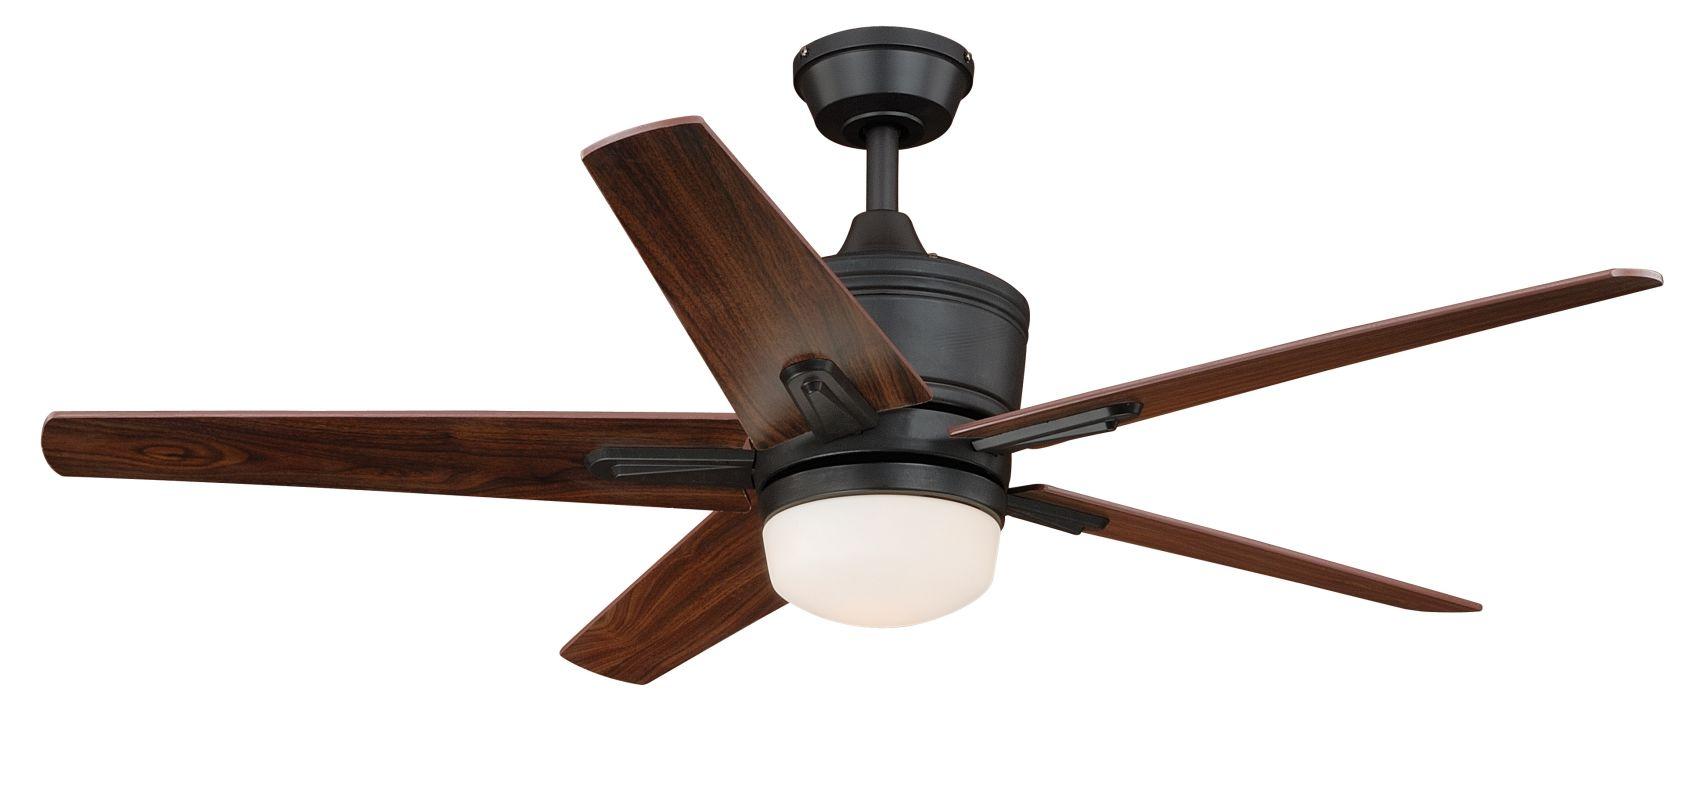 "Vaxcel Lighting F0028 Argus 52"" 5 Blade Indoor Ceiling Fan - Light Kit"